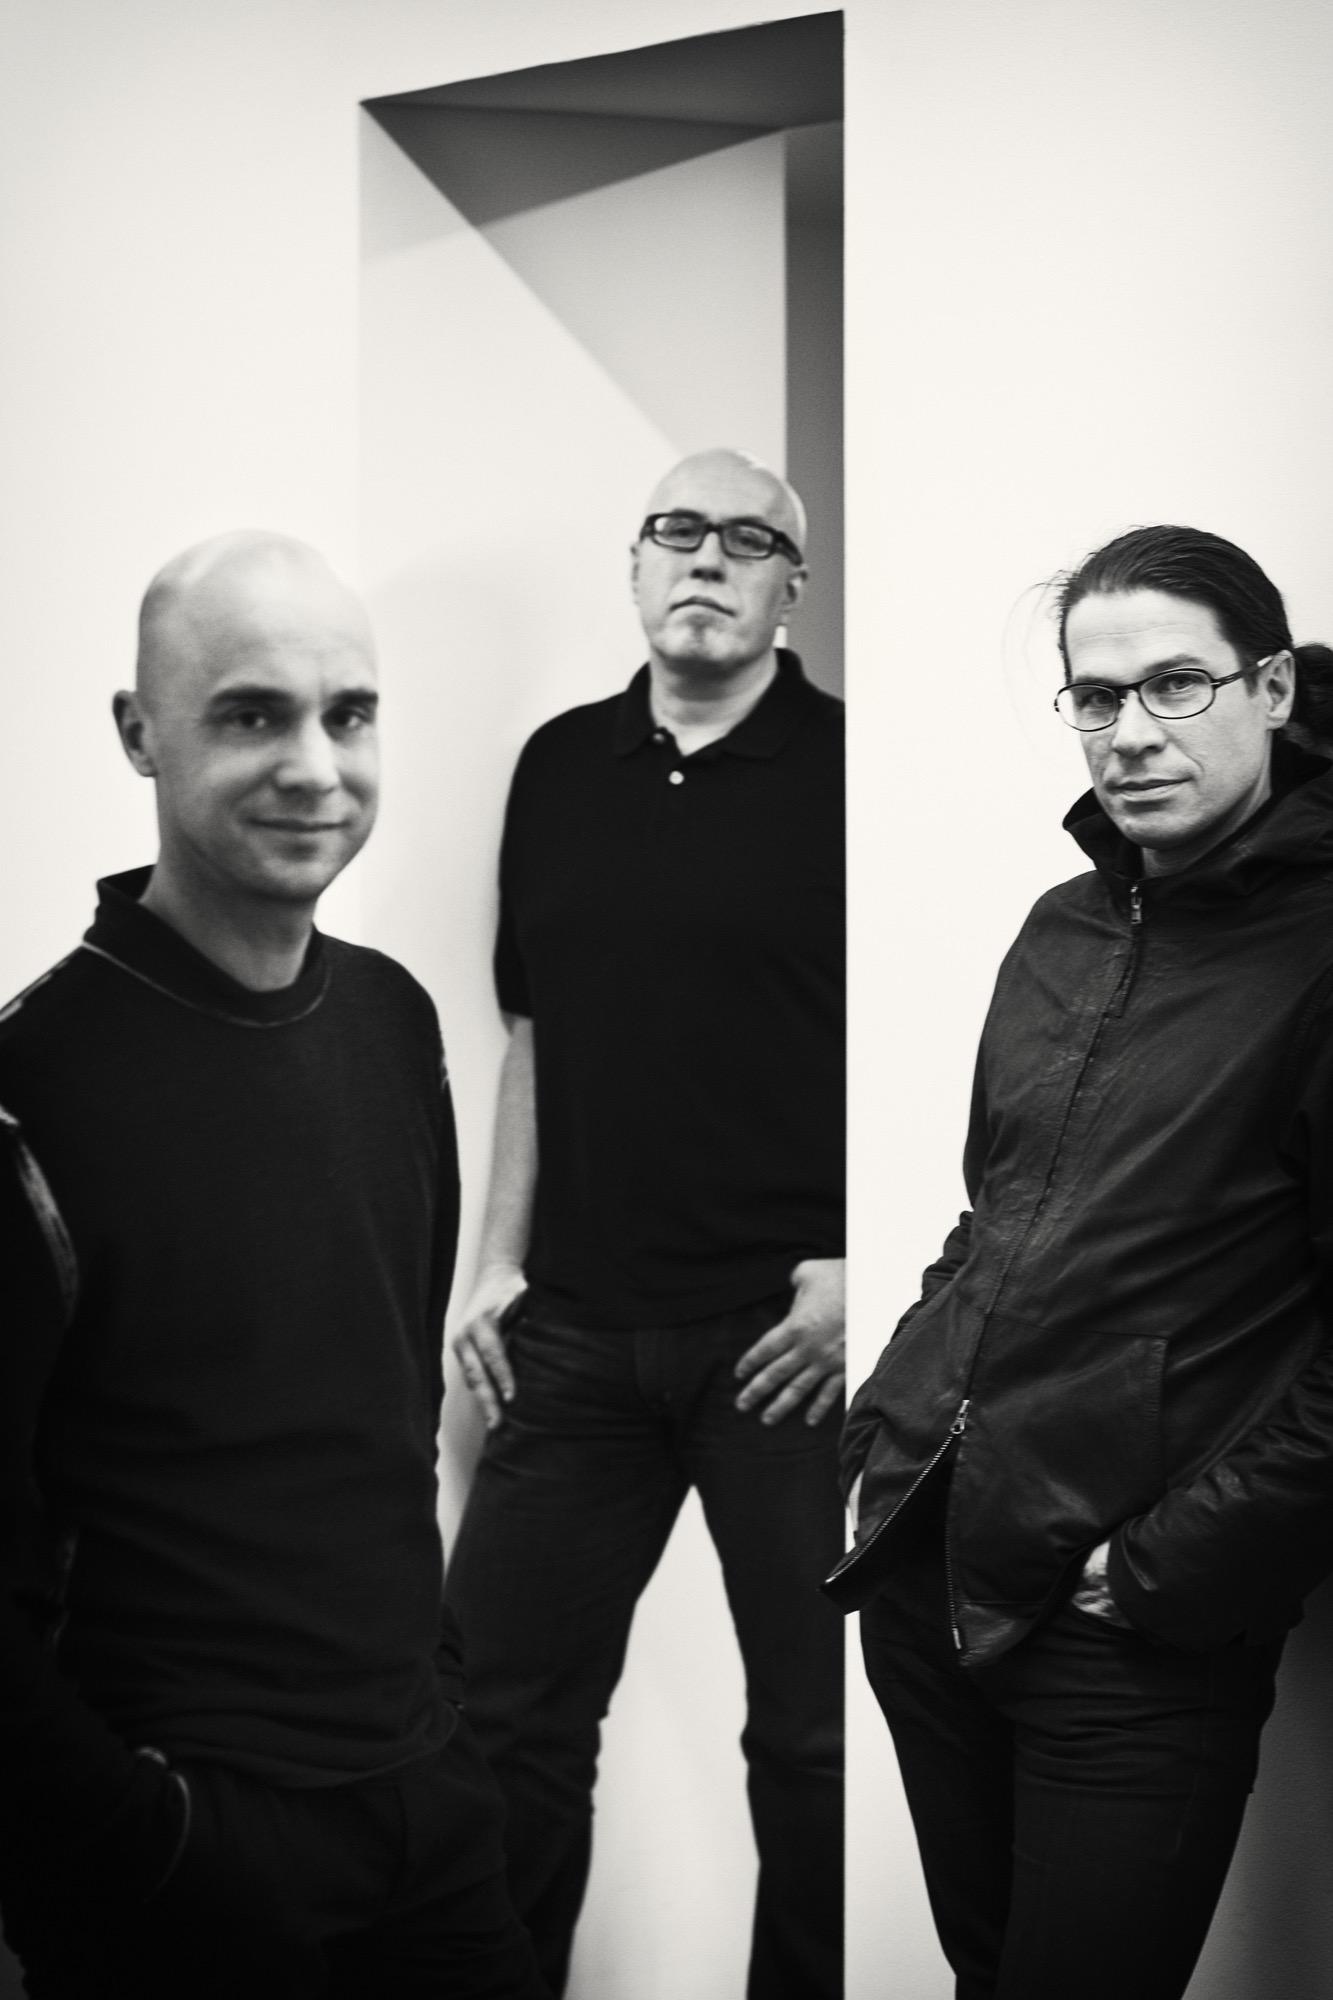 From left: Mårten Claesson, Eero Koivisto, Ola Rune the founders and eponyms of Claesson Koivisto Rune Architects / Photo by Knut Koivisto